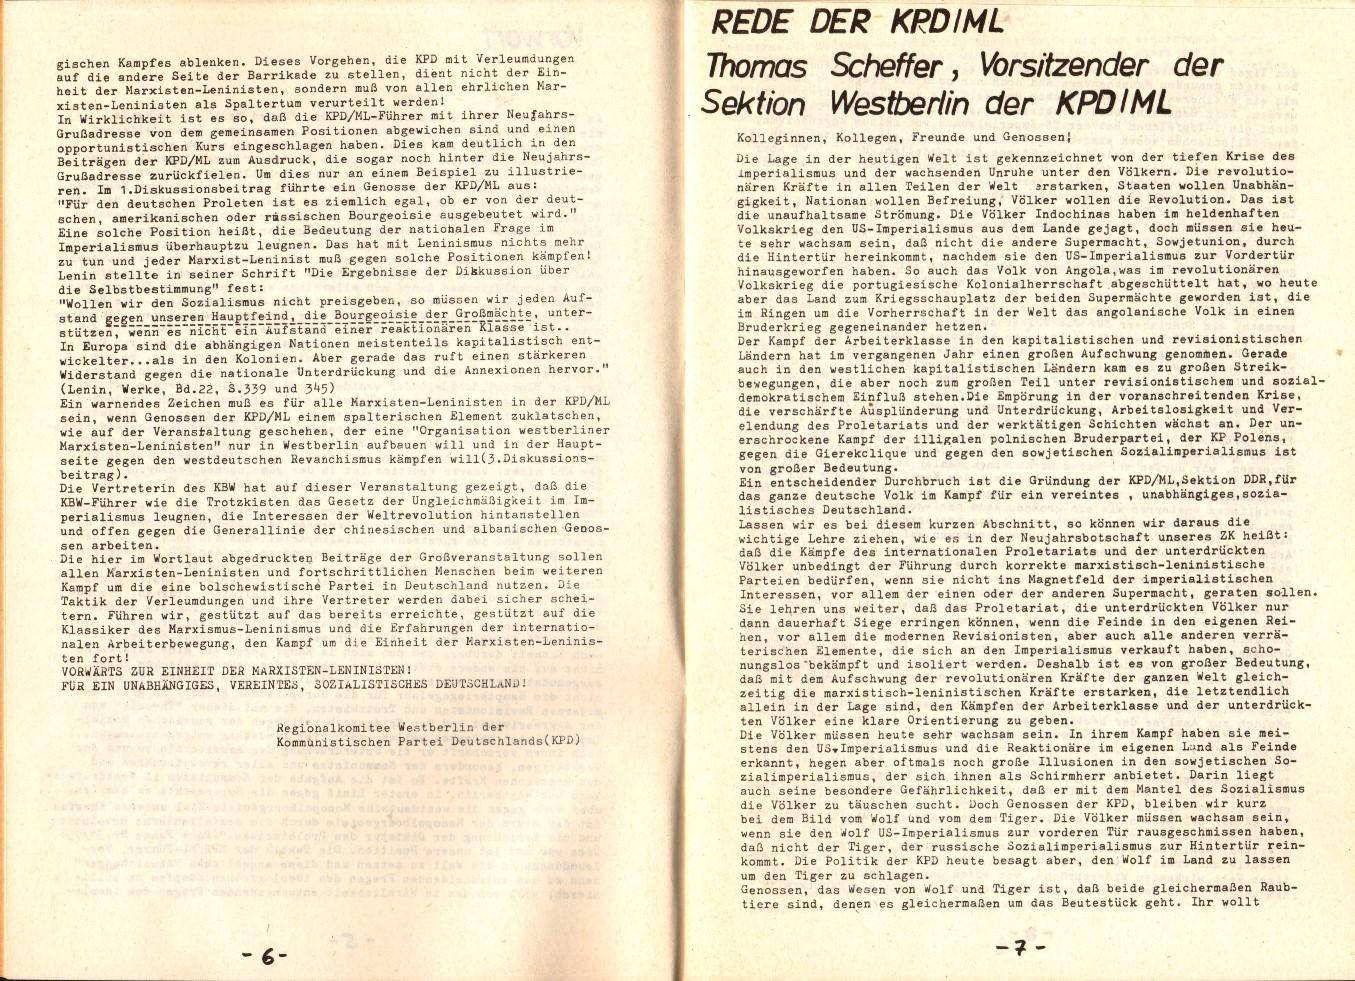 Berlin_AO_1976_Veranstaltung_mit_KPDML_04